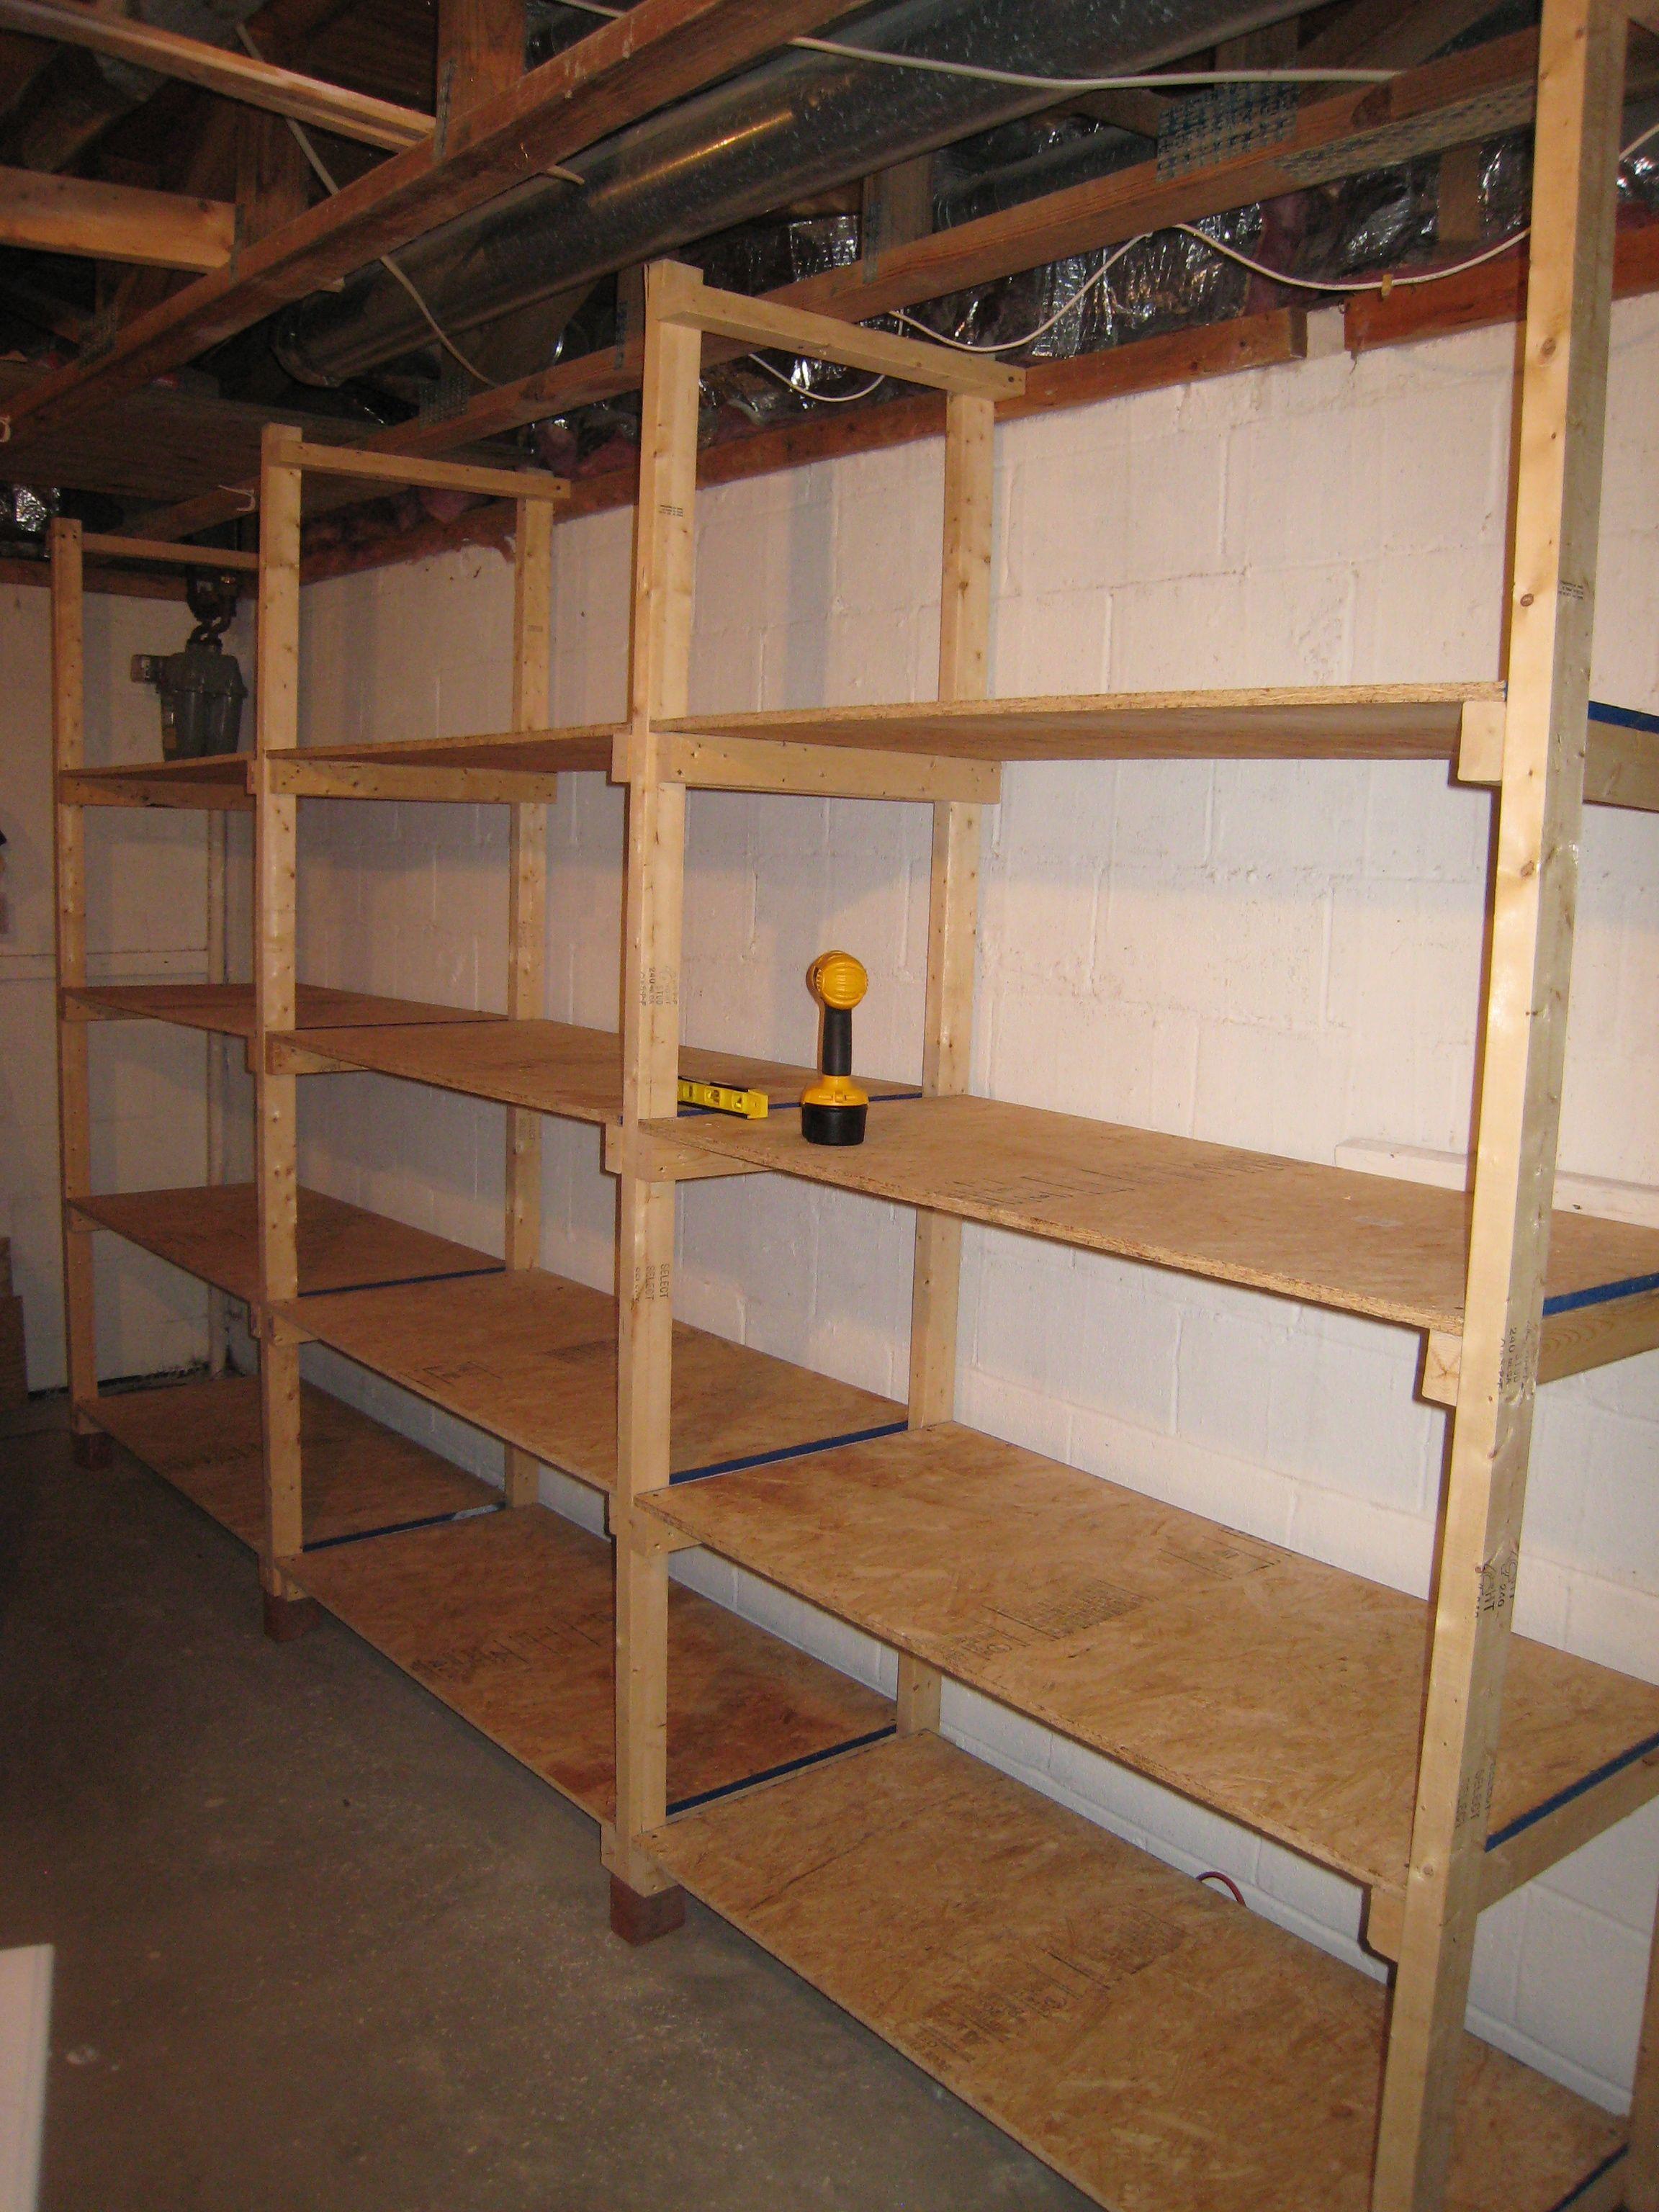 Build Diy Images Of Wood Storage Shelves Plans Wooden Woodworking